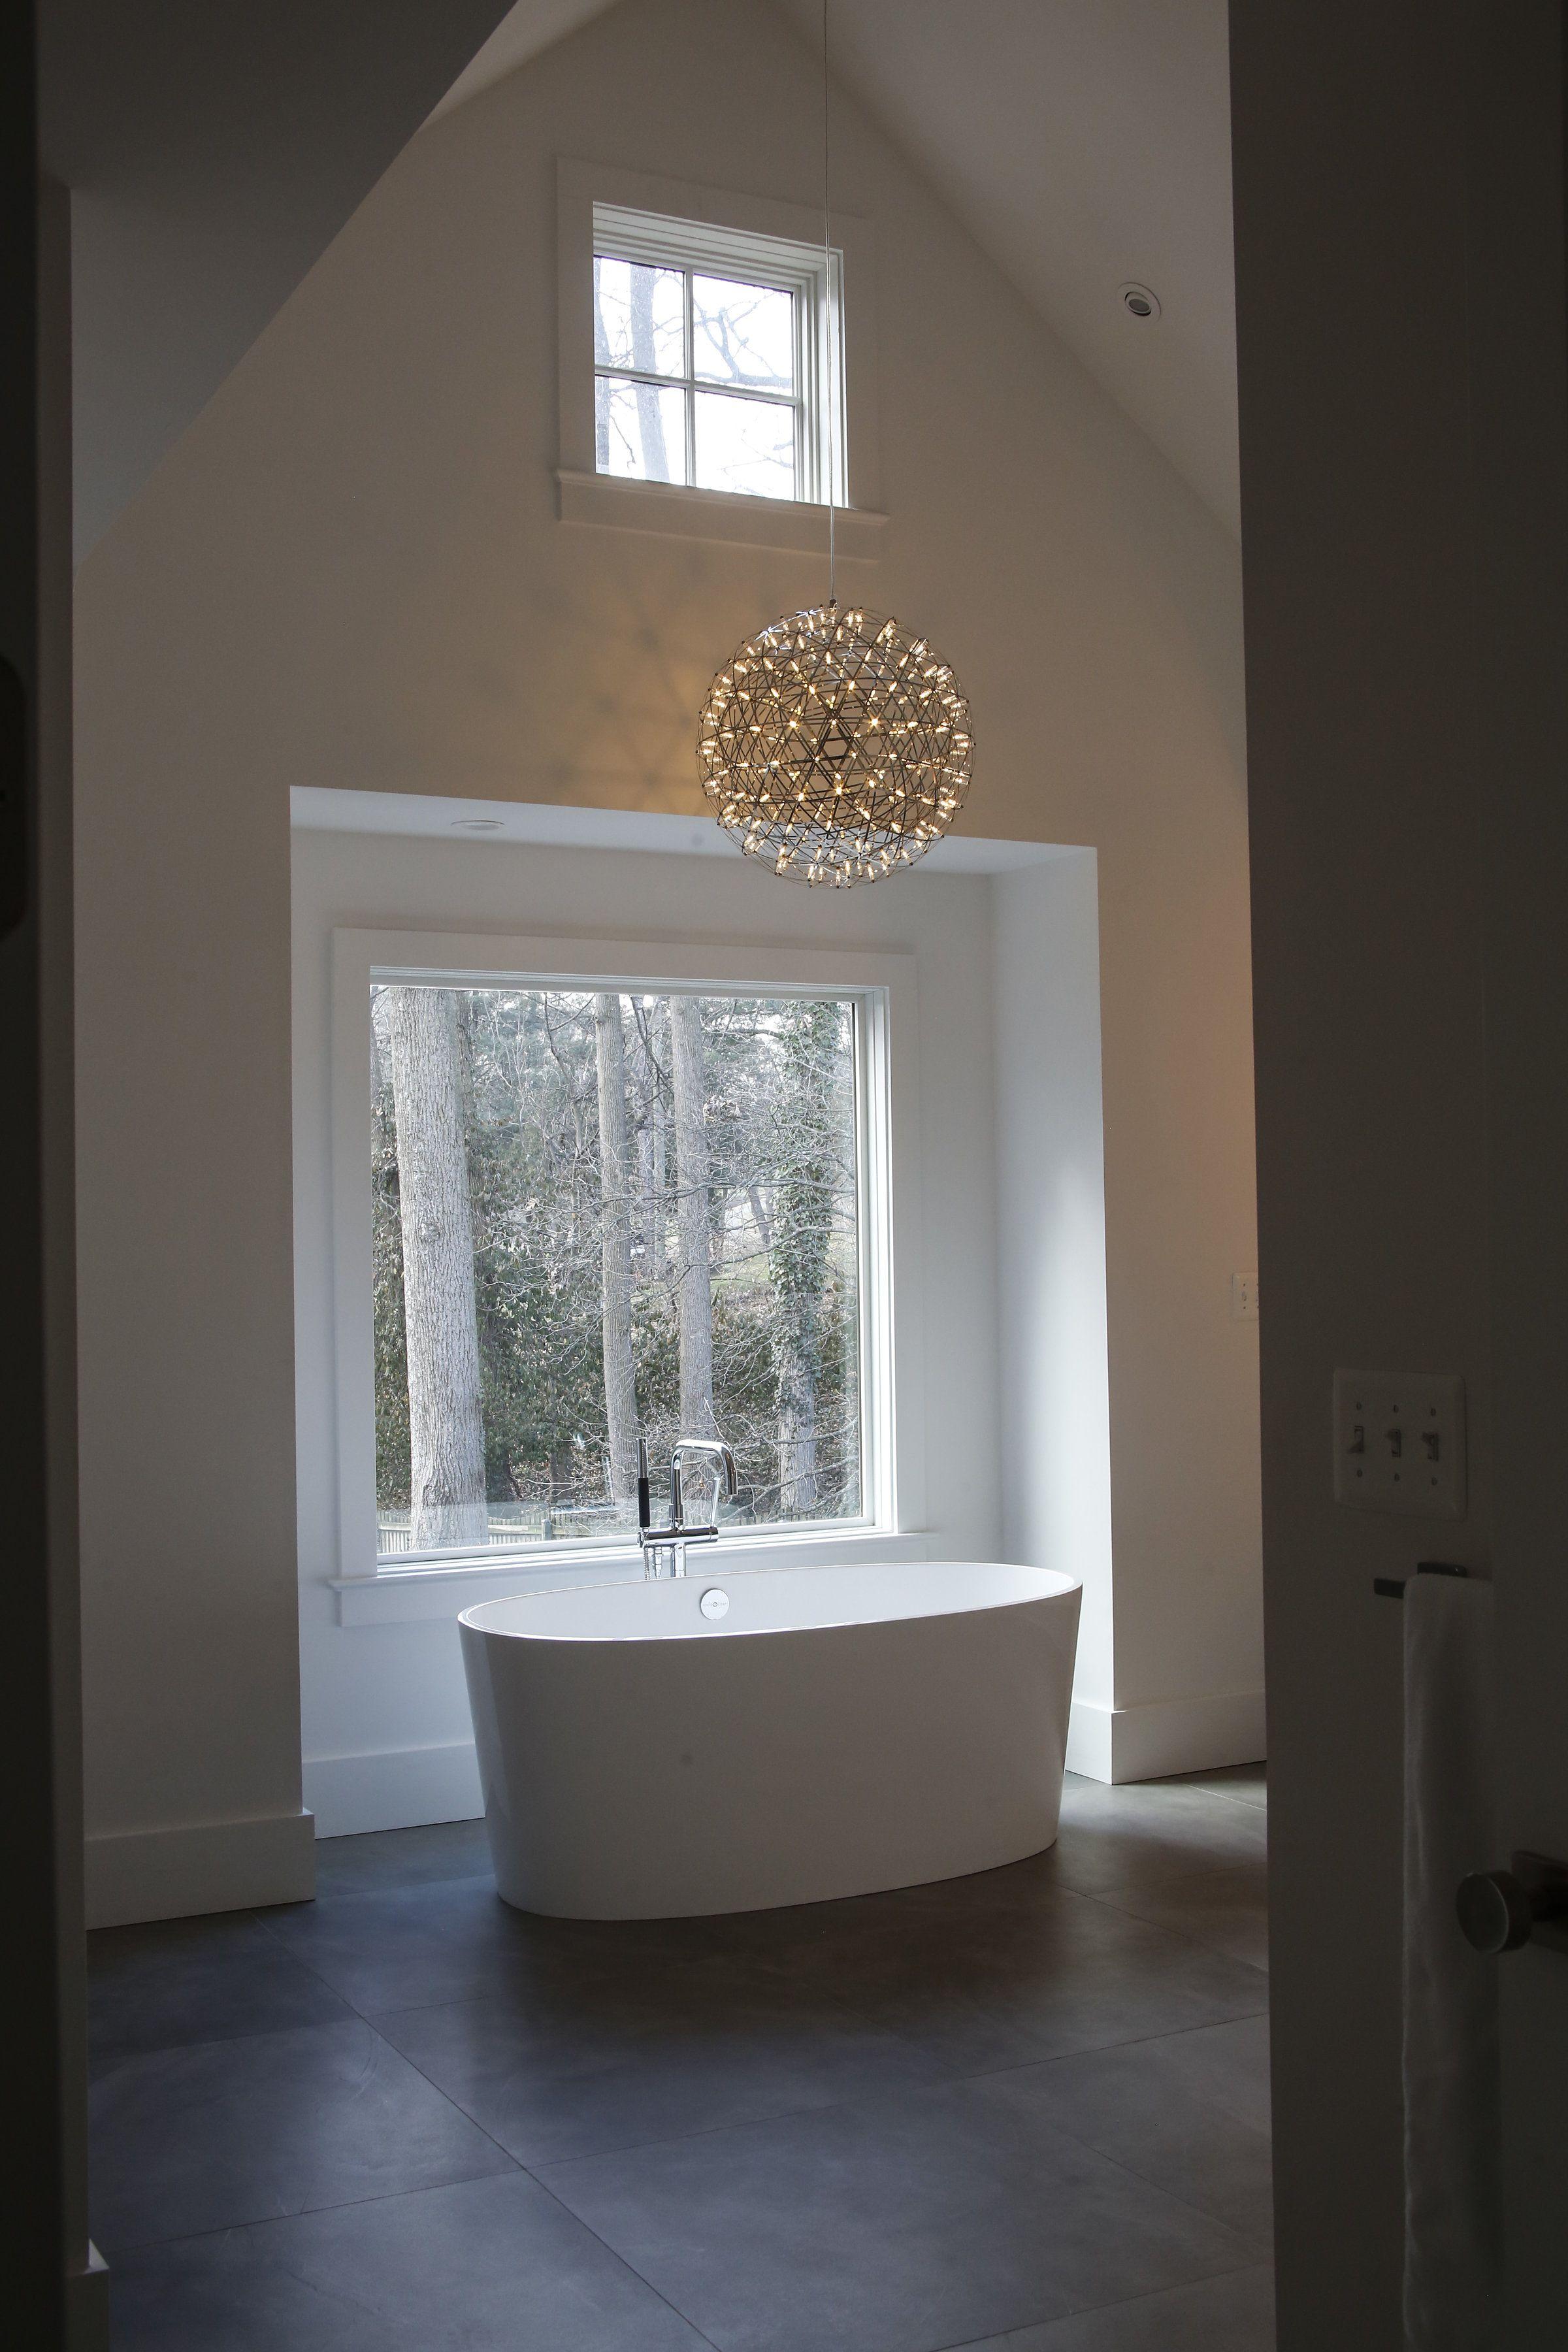 Private Home In Arlington Virginia Lighting Design By Nicole Brose Commercial Lighting Chandelier Decor Sconce Lighting